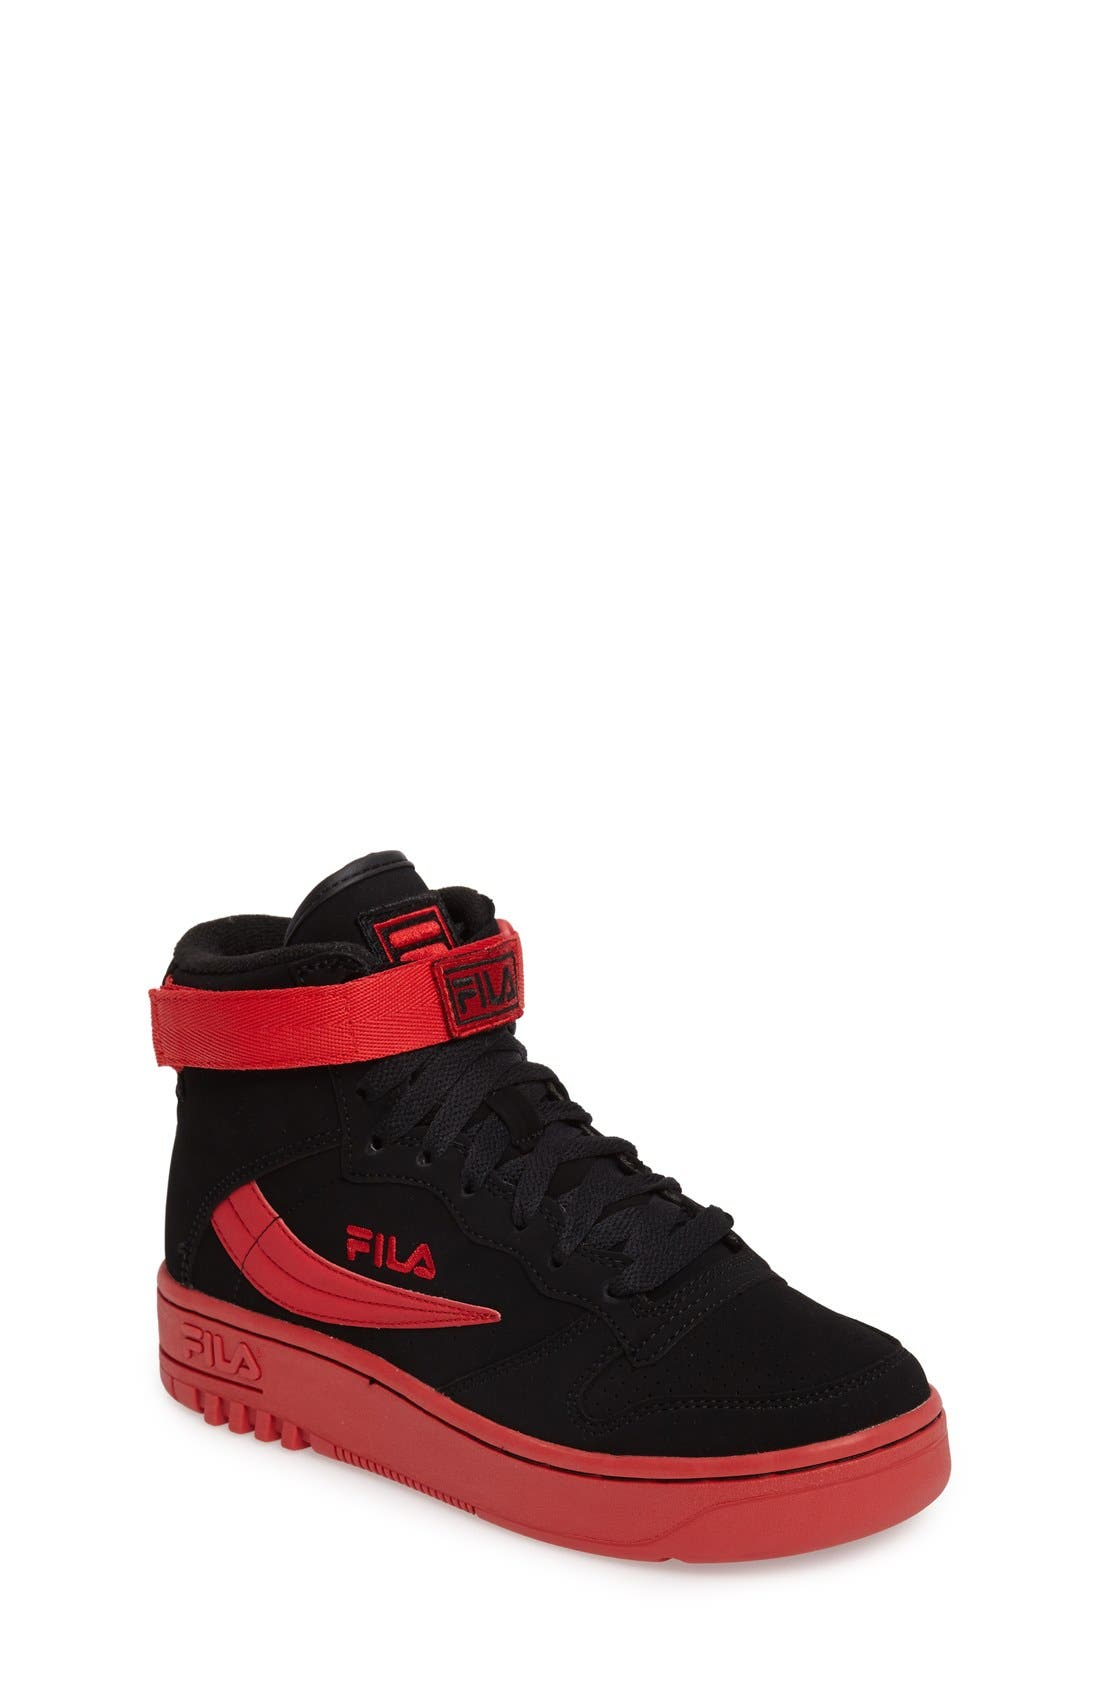 USA FX-100 High Top Sneaker,                         Main,                         color, 001